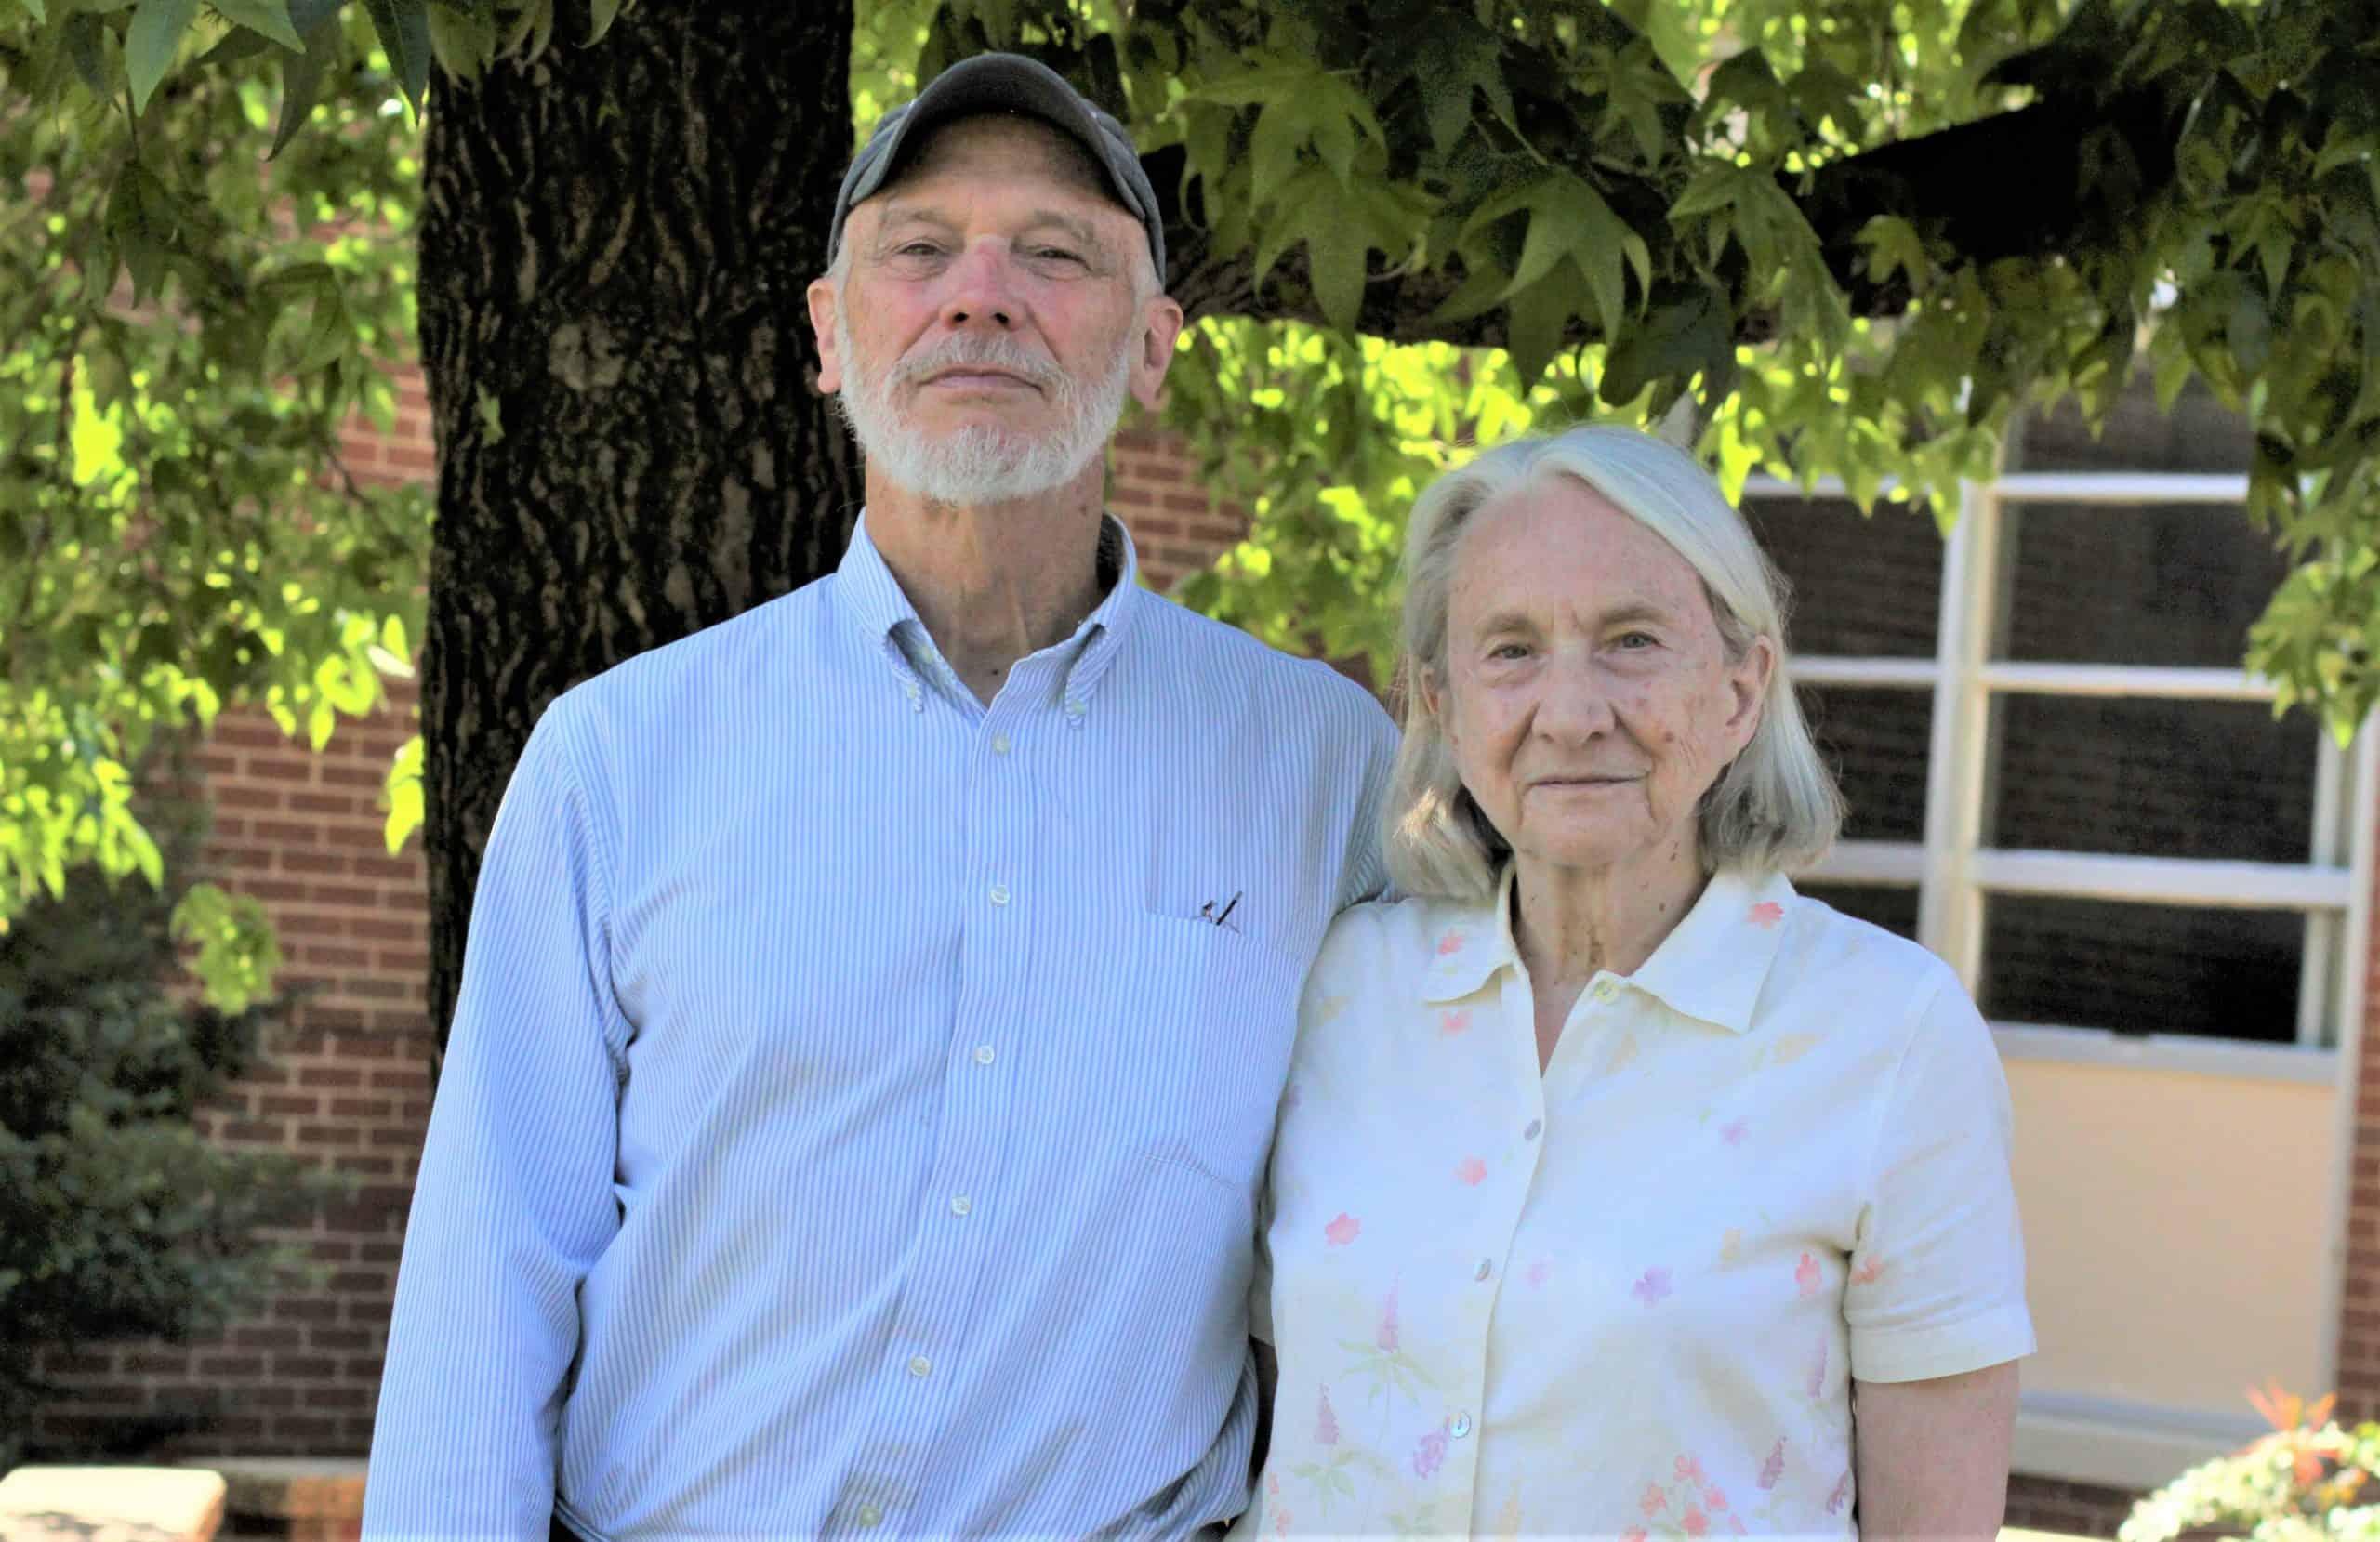 John and Kathryn Stoltzfus Fairfield, both class of '66